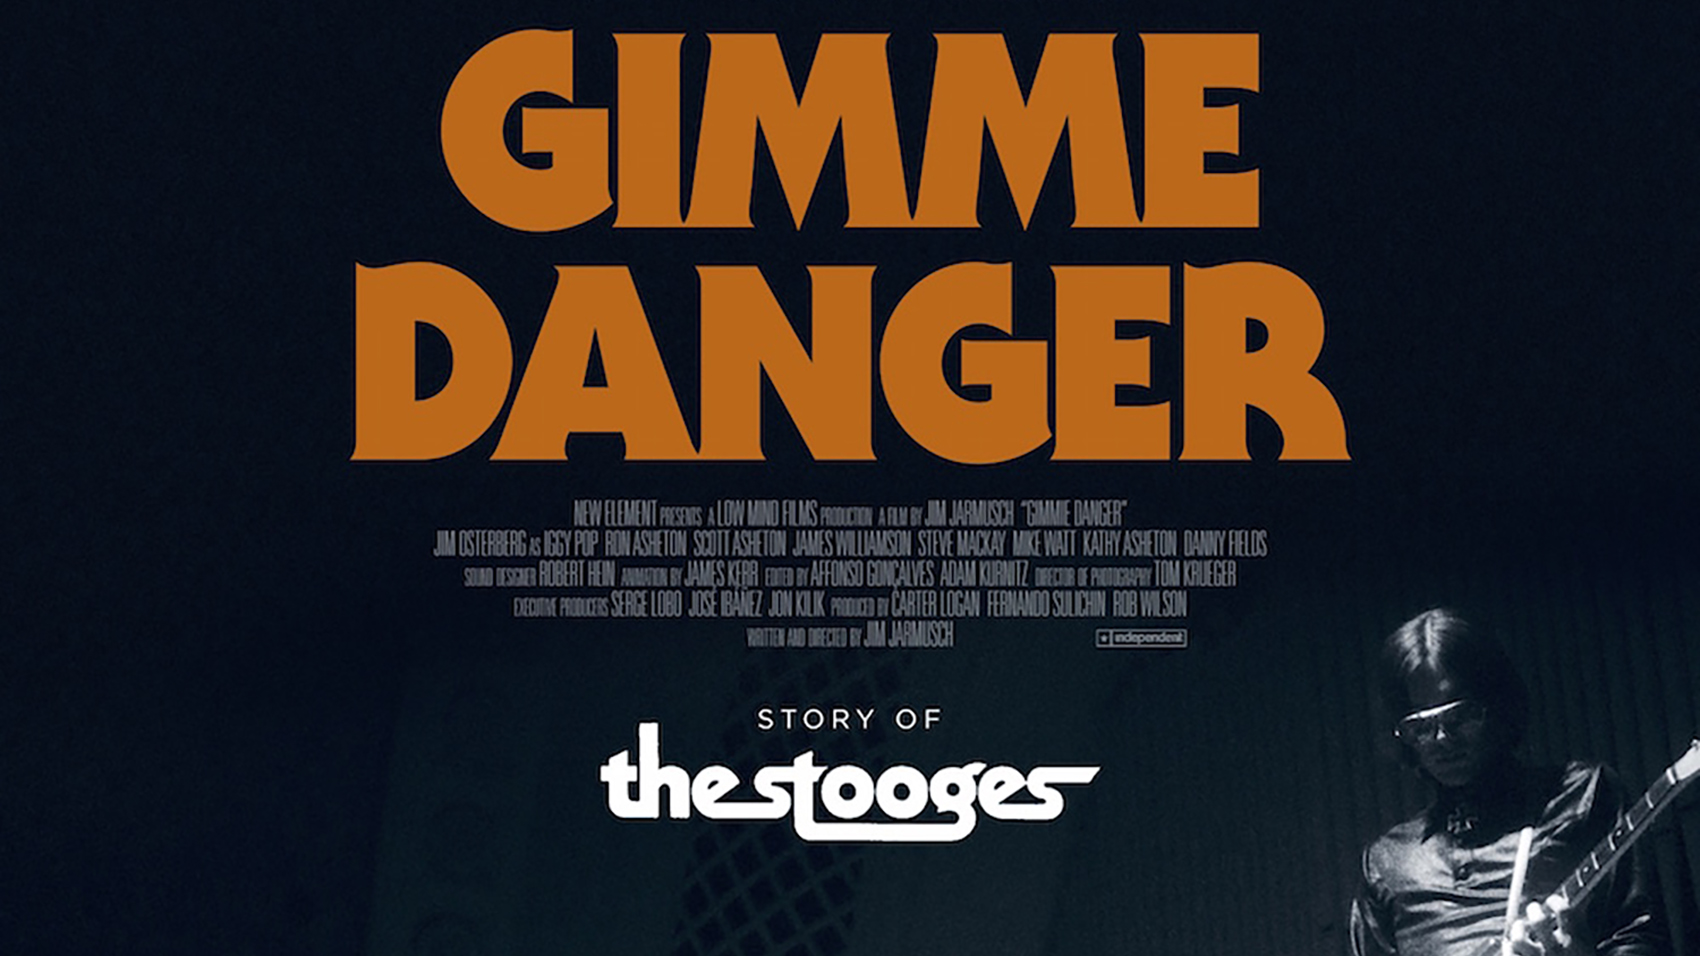 the stooges album